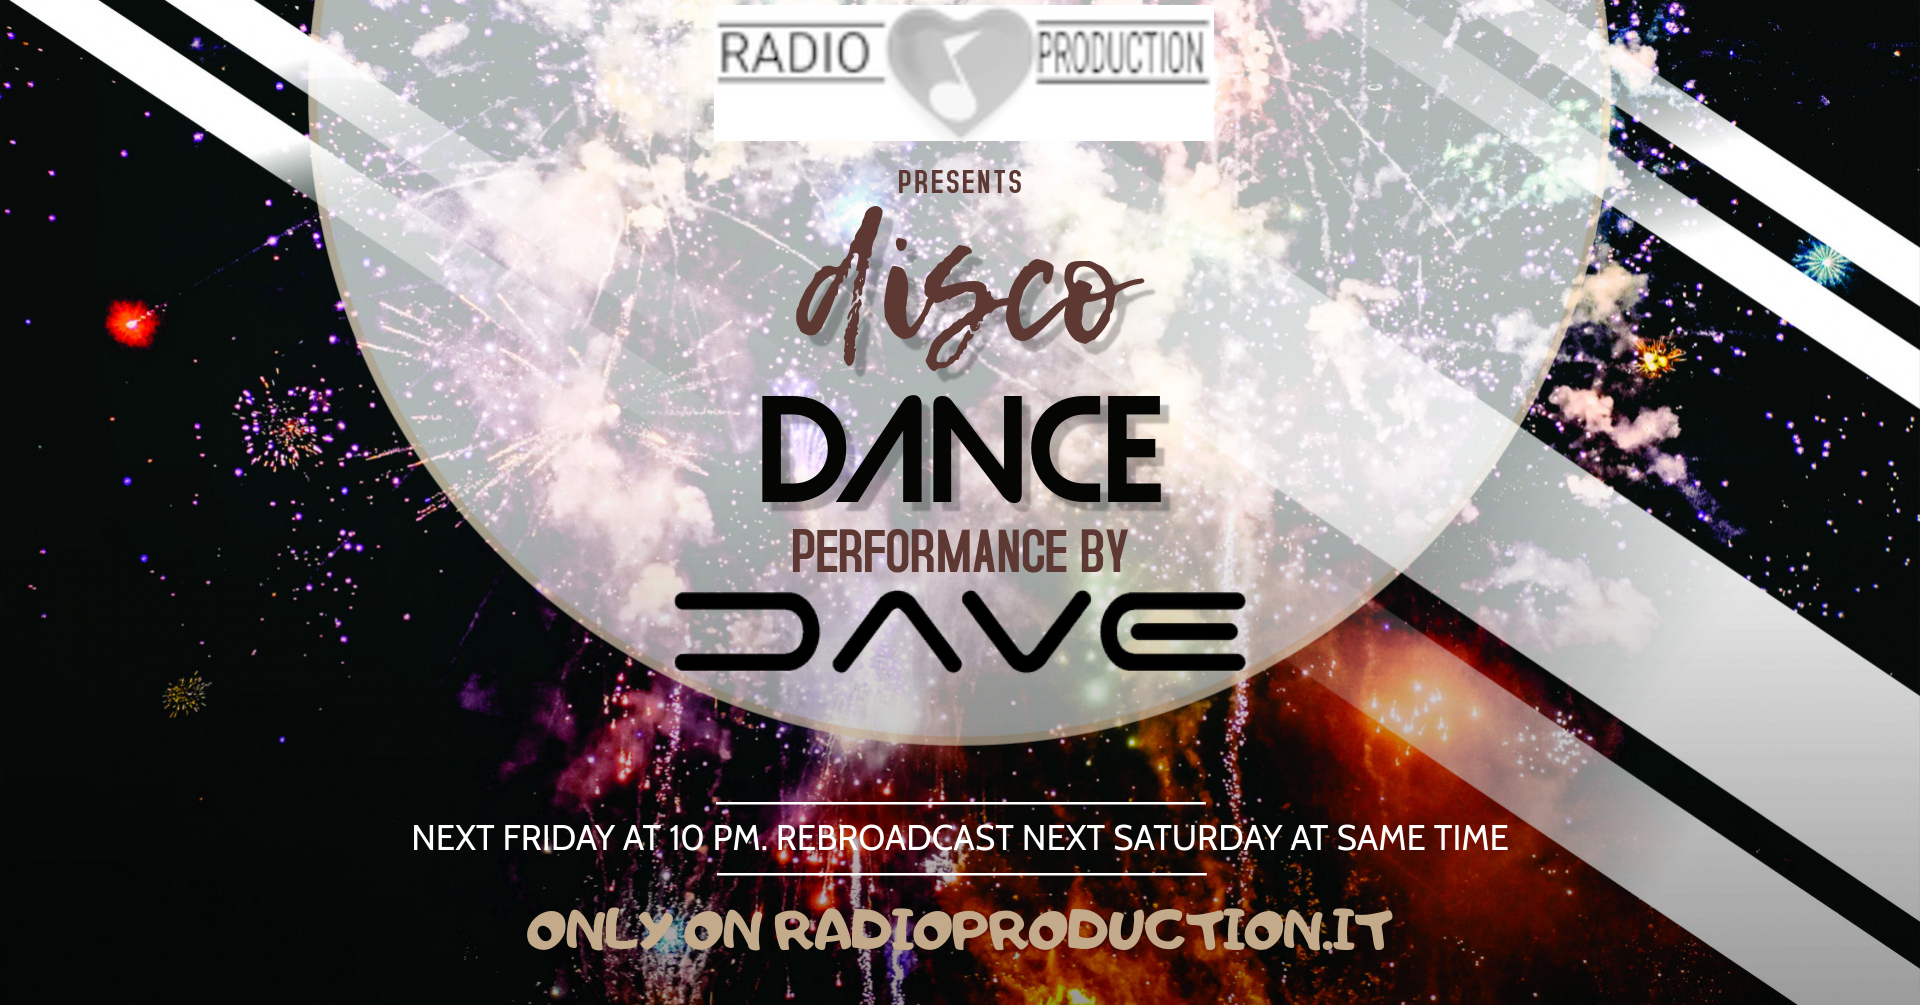 Disco DANCE: Best EDM music 2010-2020 by Dj Dave